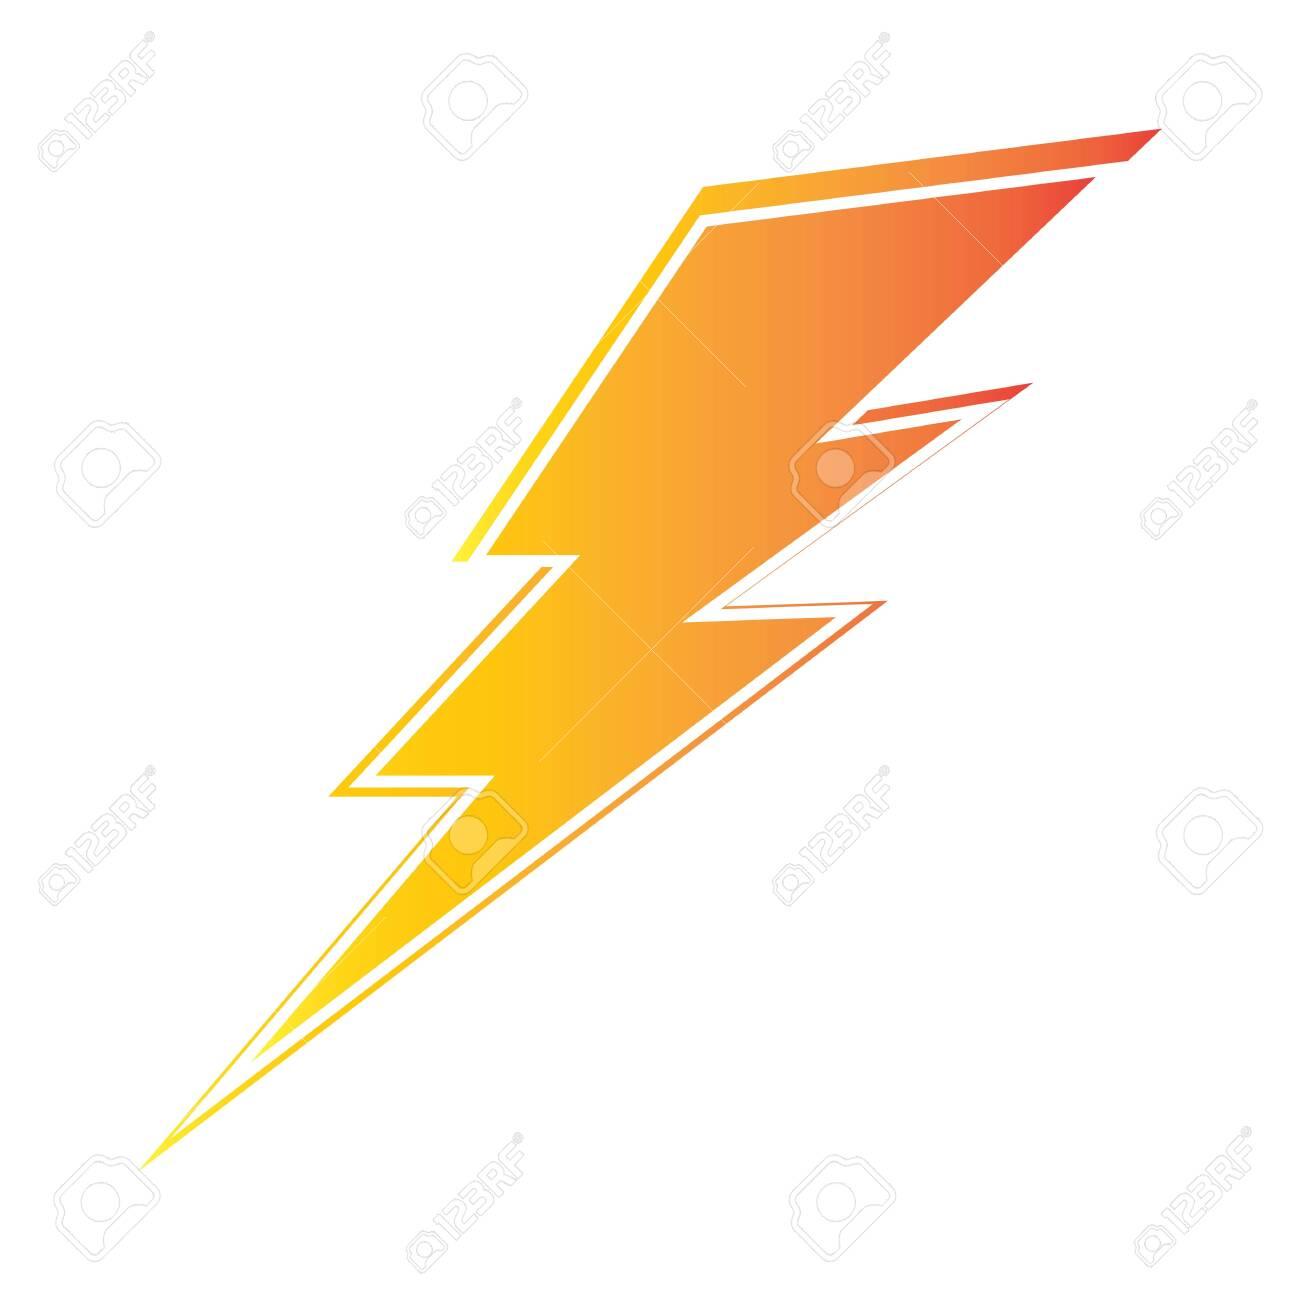 lightning thunderbolt electricity design template - 146504001